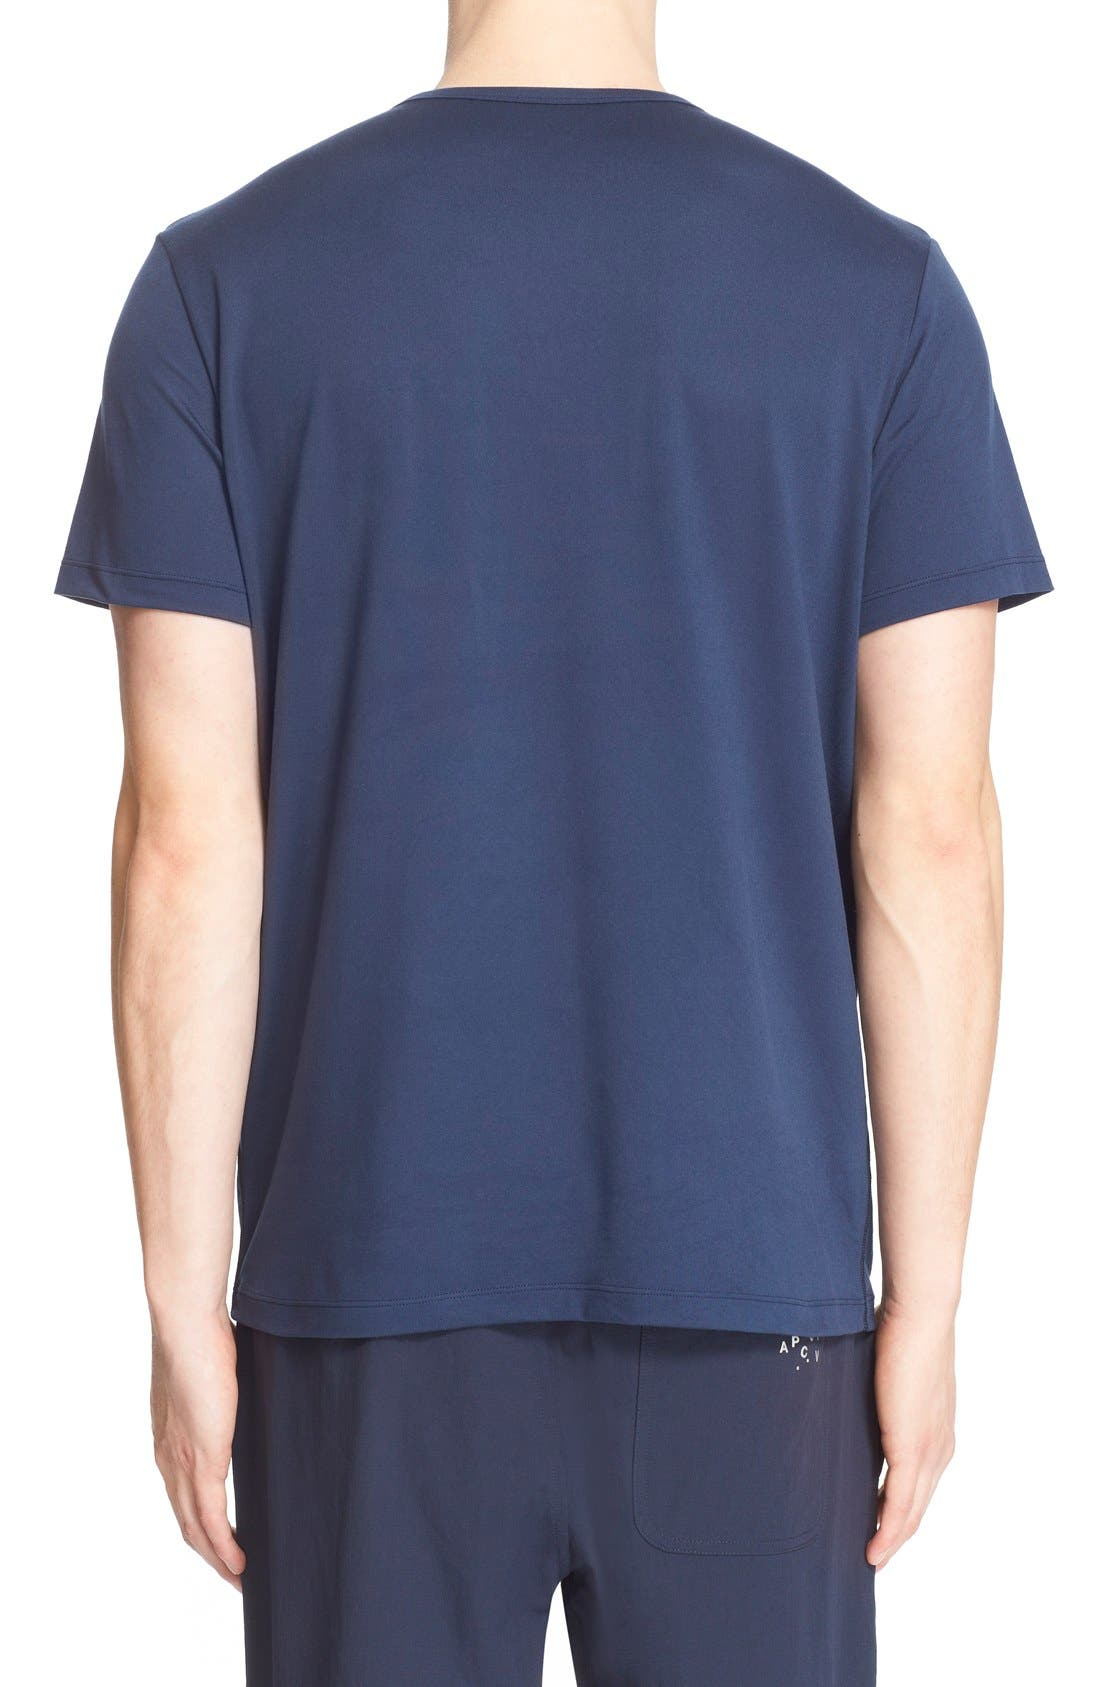 and Outdoor Voices 'Austin' Crewneck Logo T-Shirt,                             Alternate thumbnail 2, color,                             410